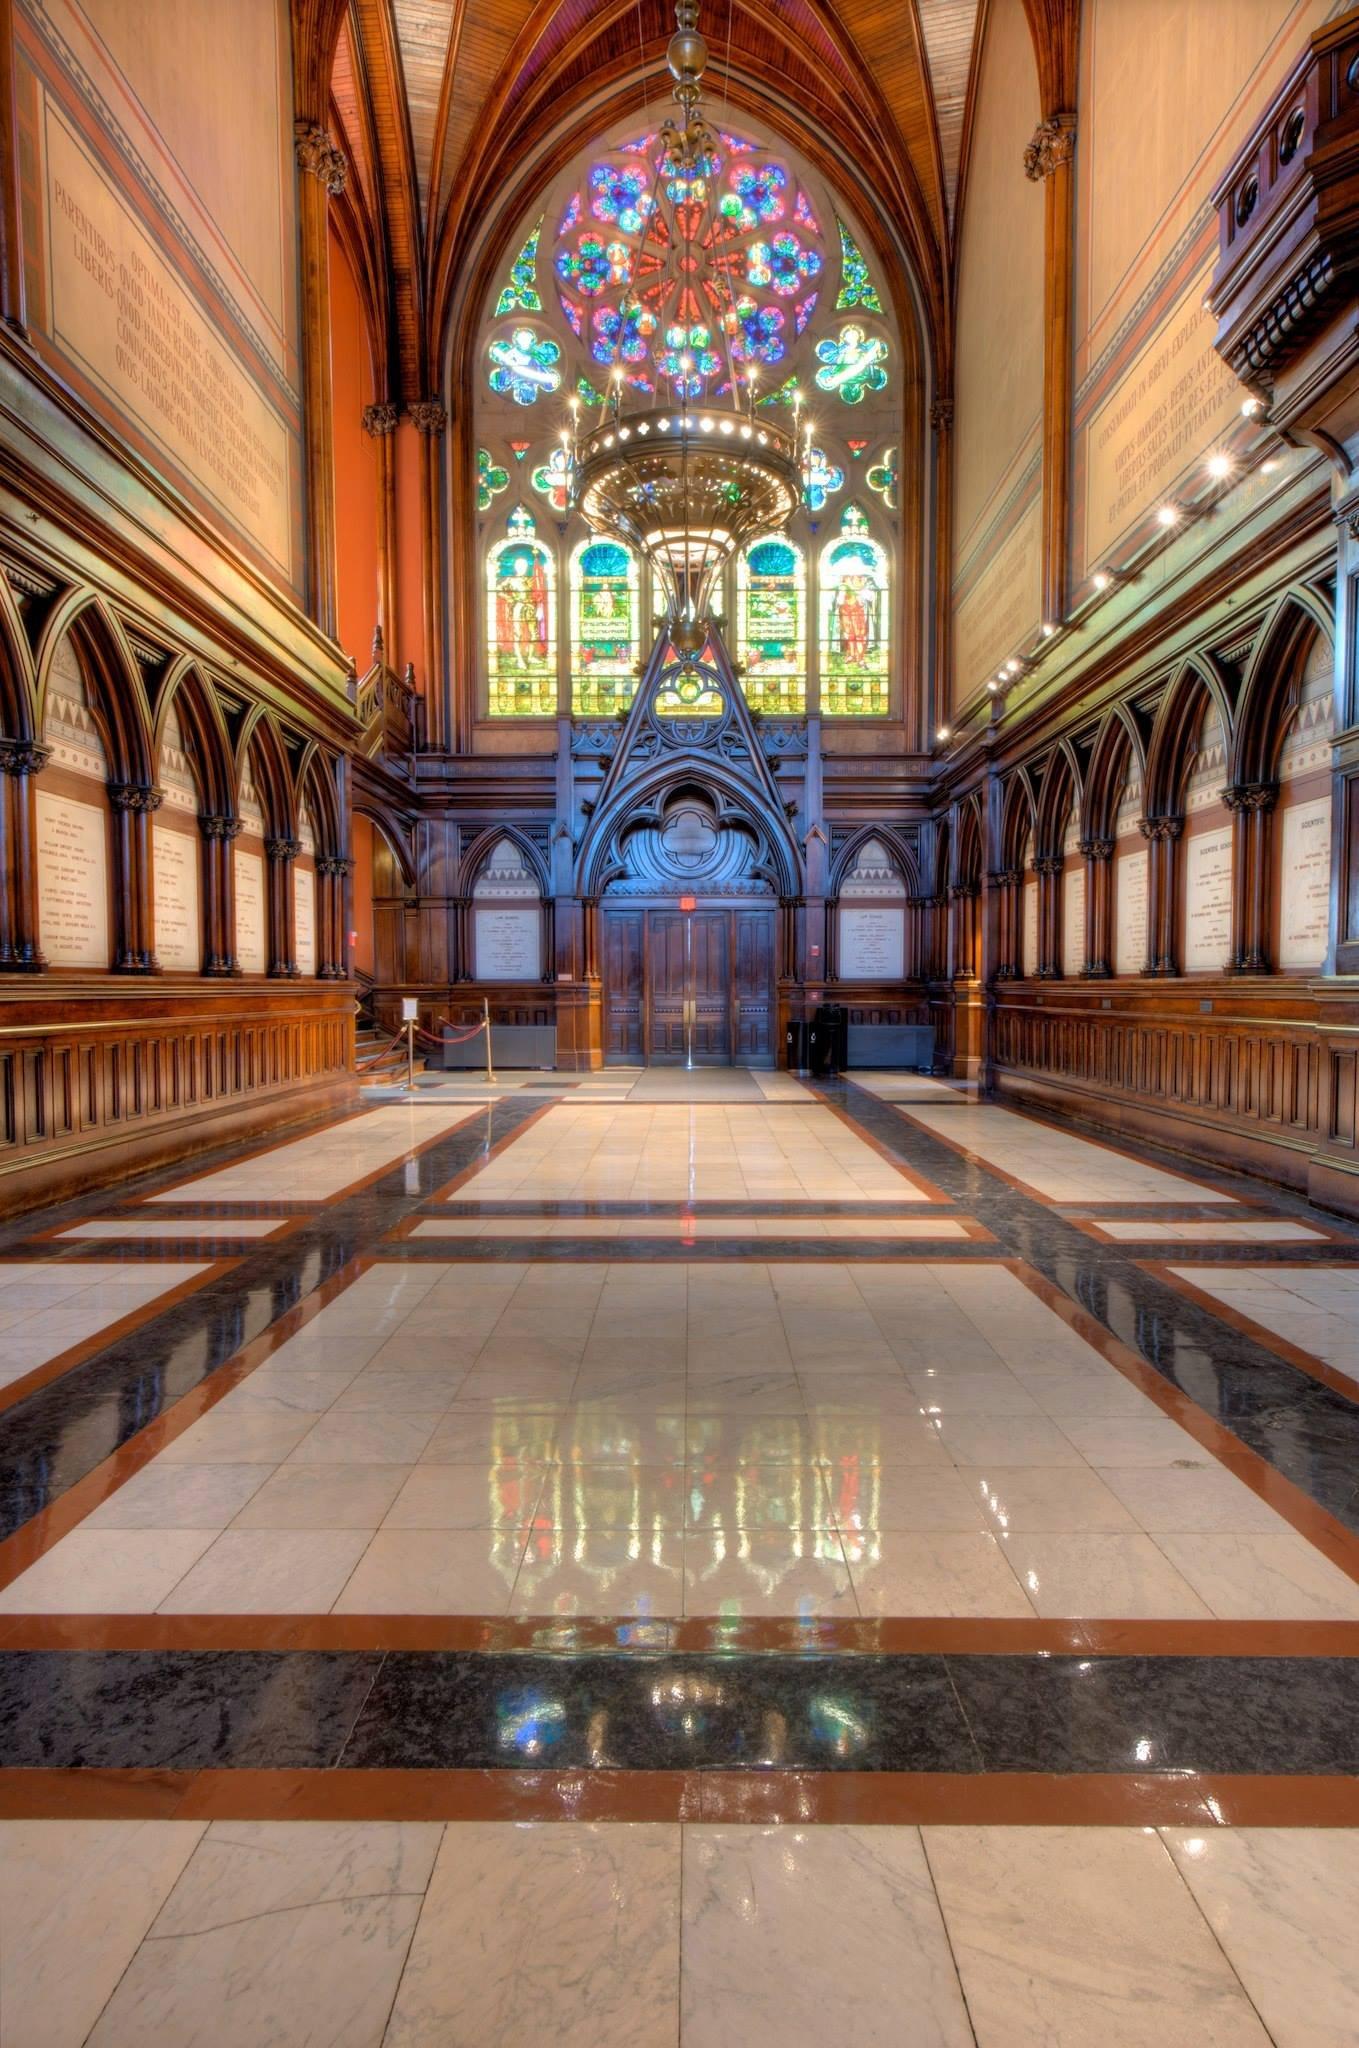 Brimmer Memorial Window in the Memorial Transept